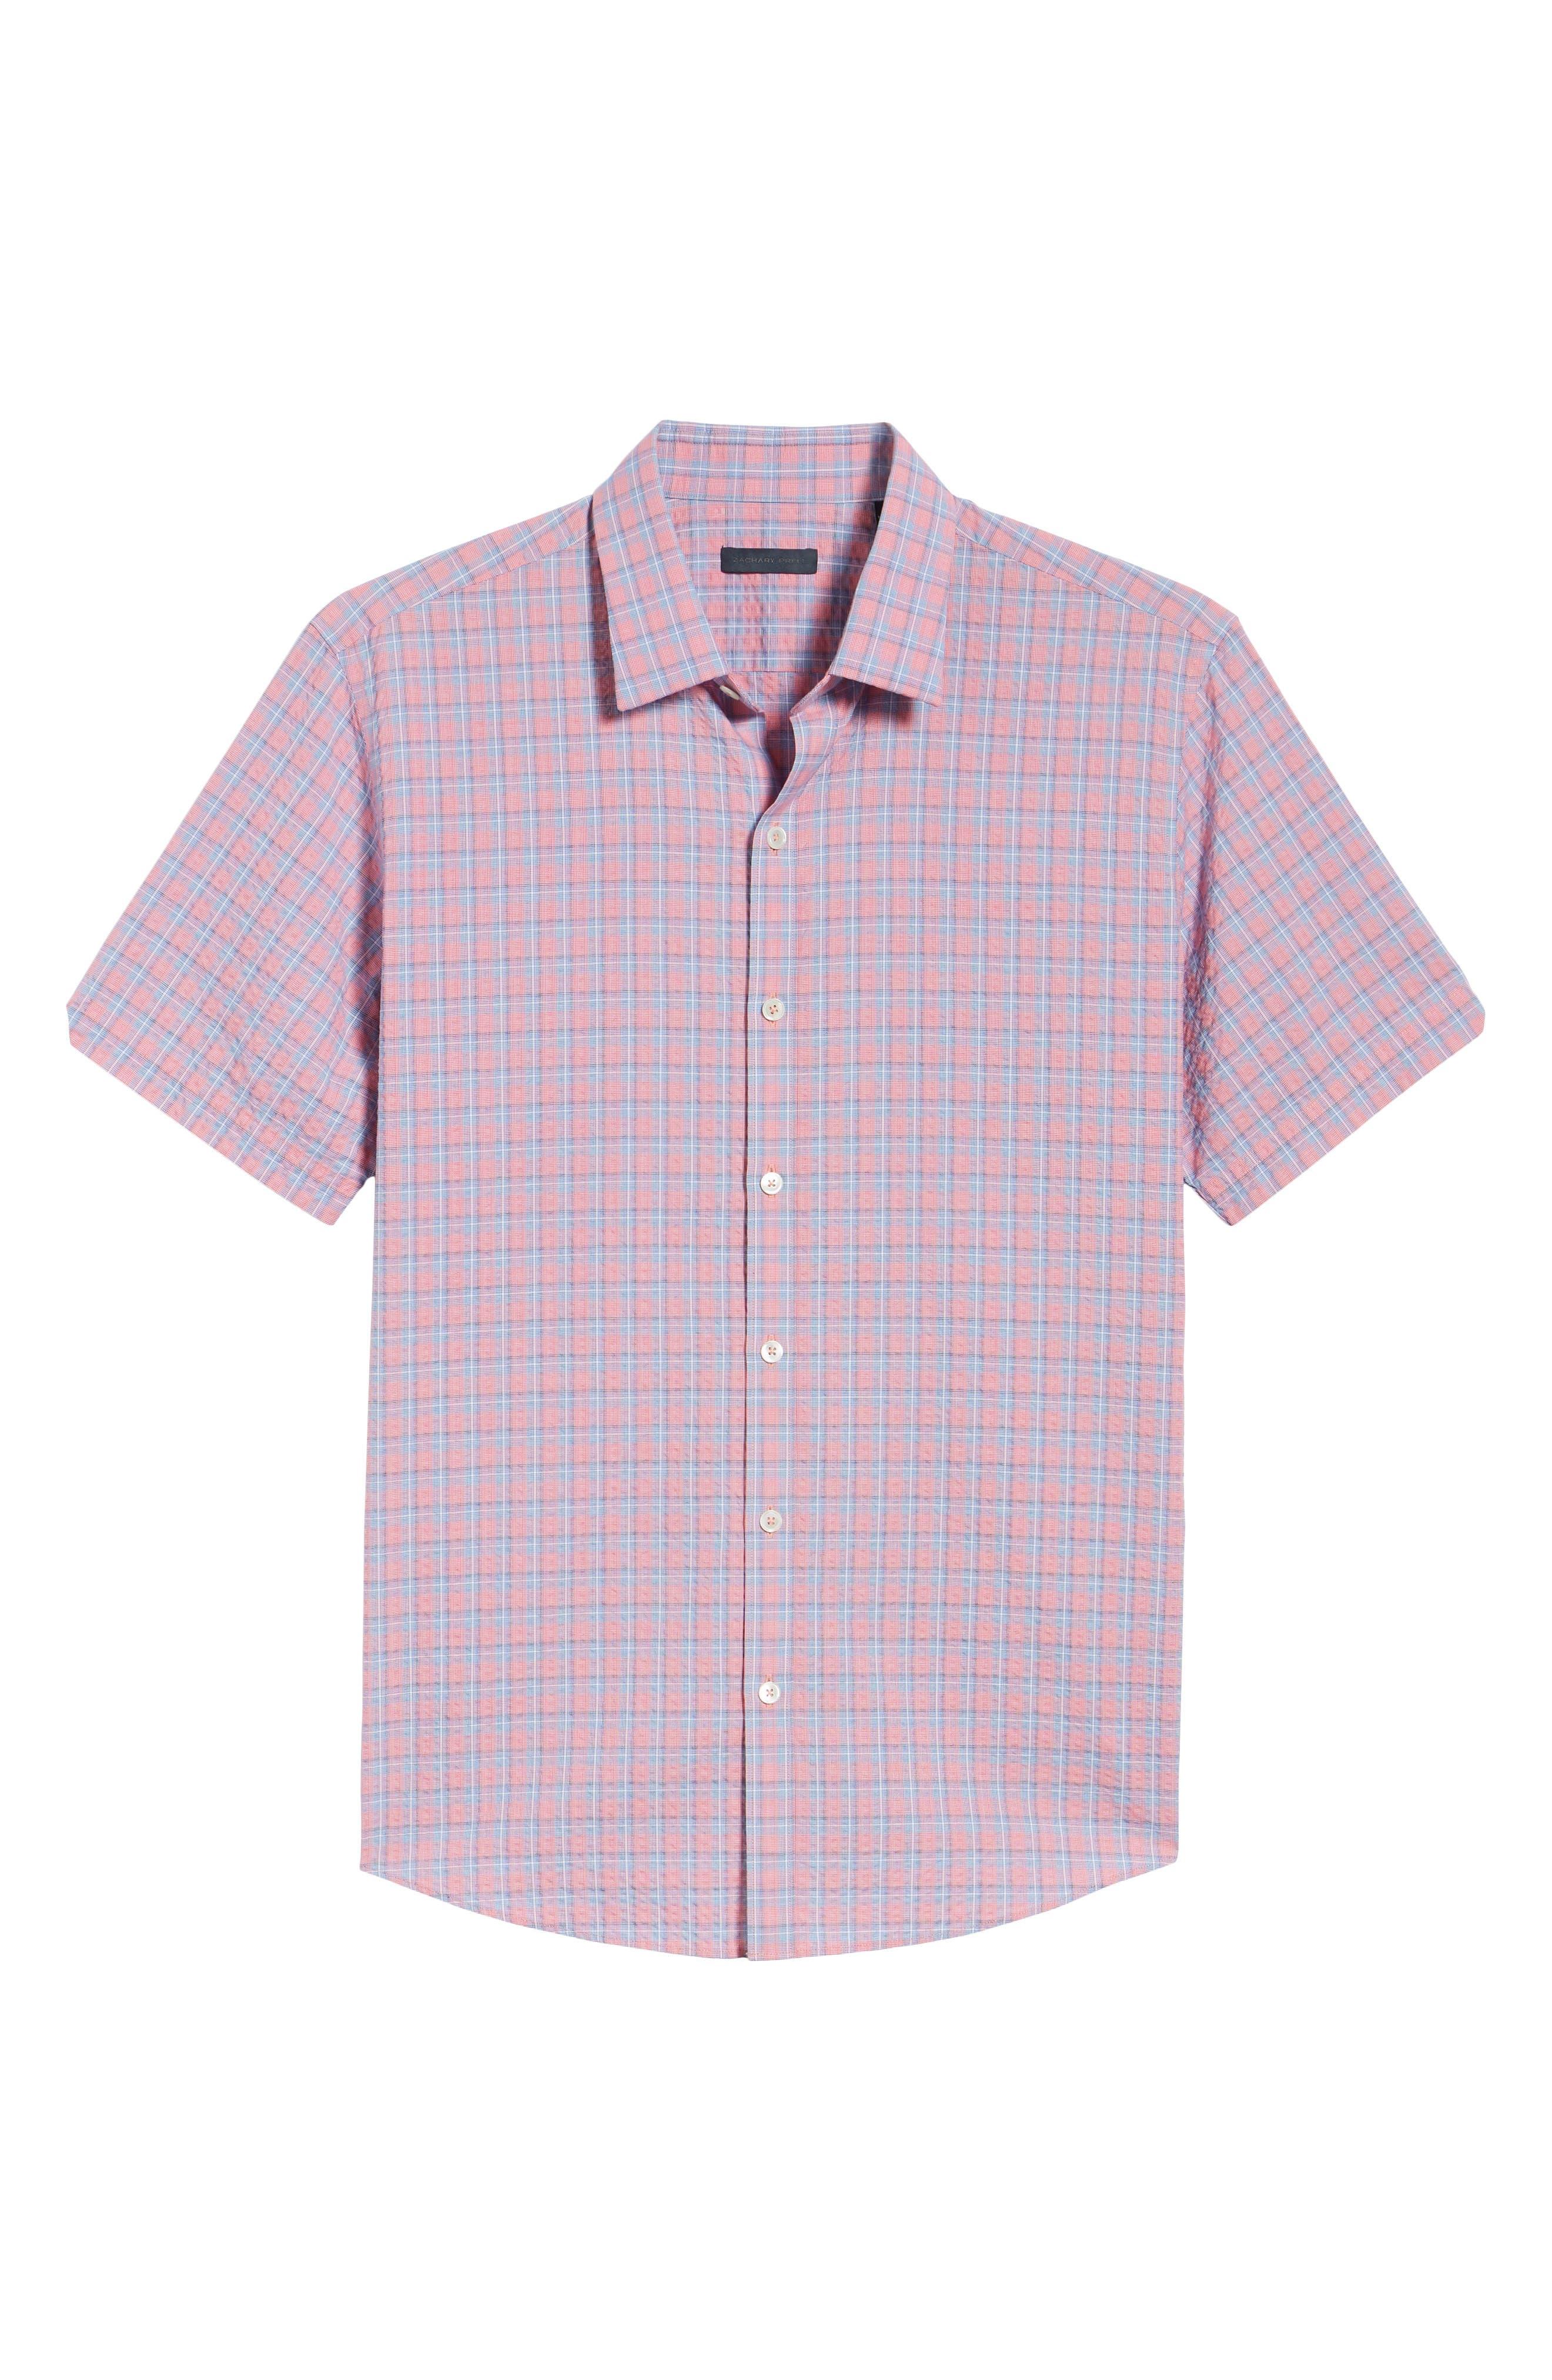 Luna Trim Fit Seersucker Sport Shirt,                             Alternate thumbnail 6, color,                             632